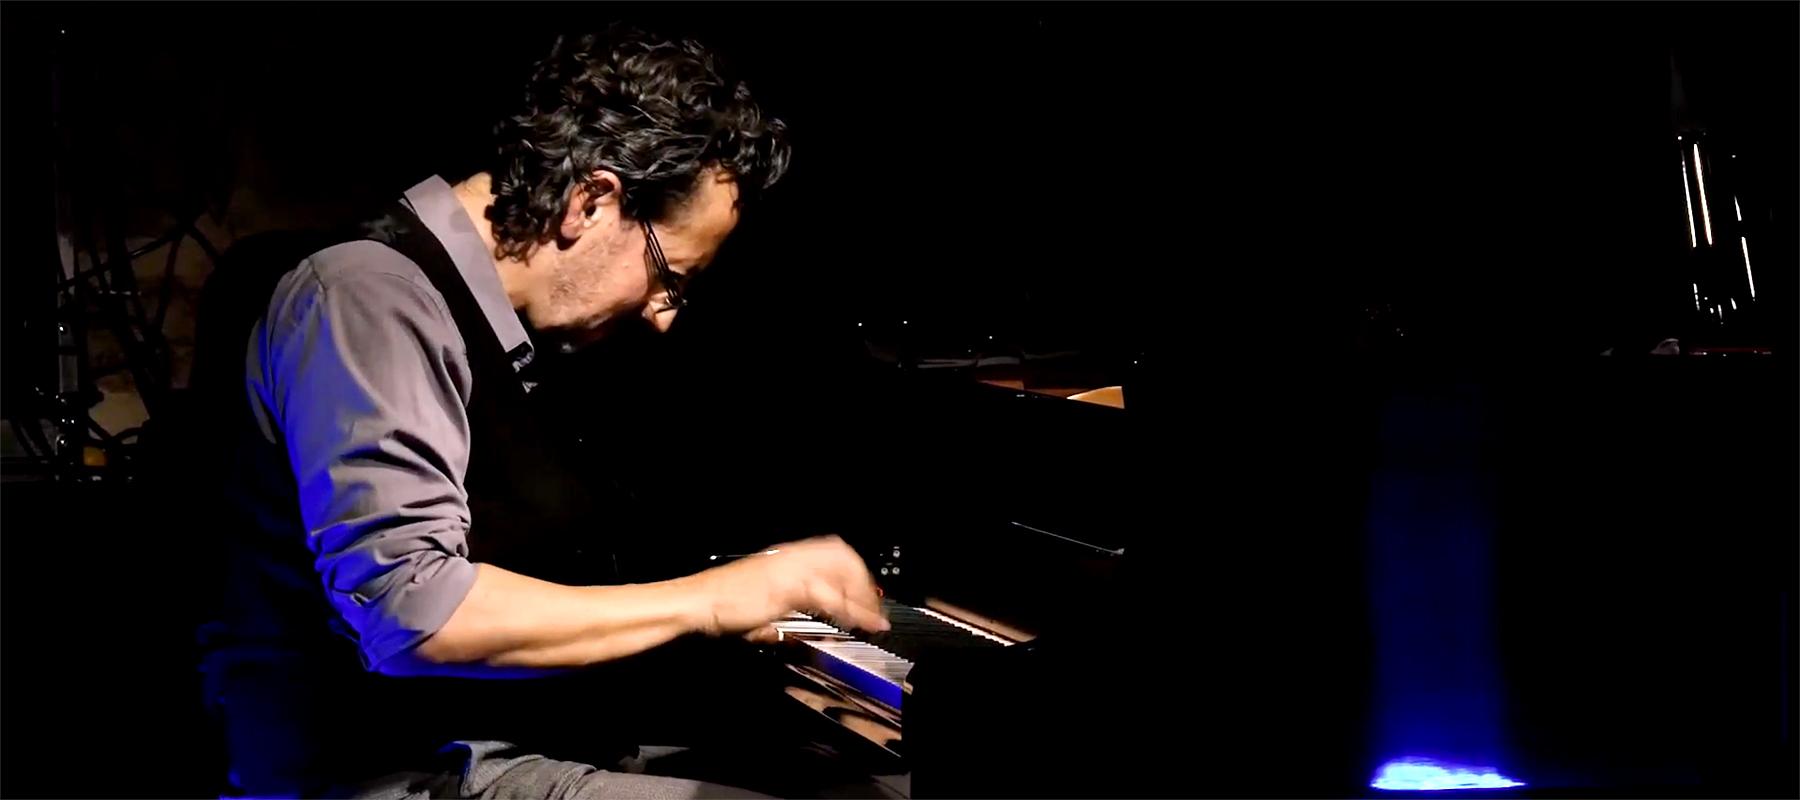 Bruno Angelini